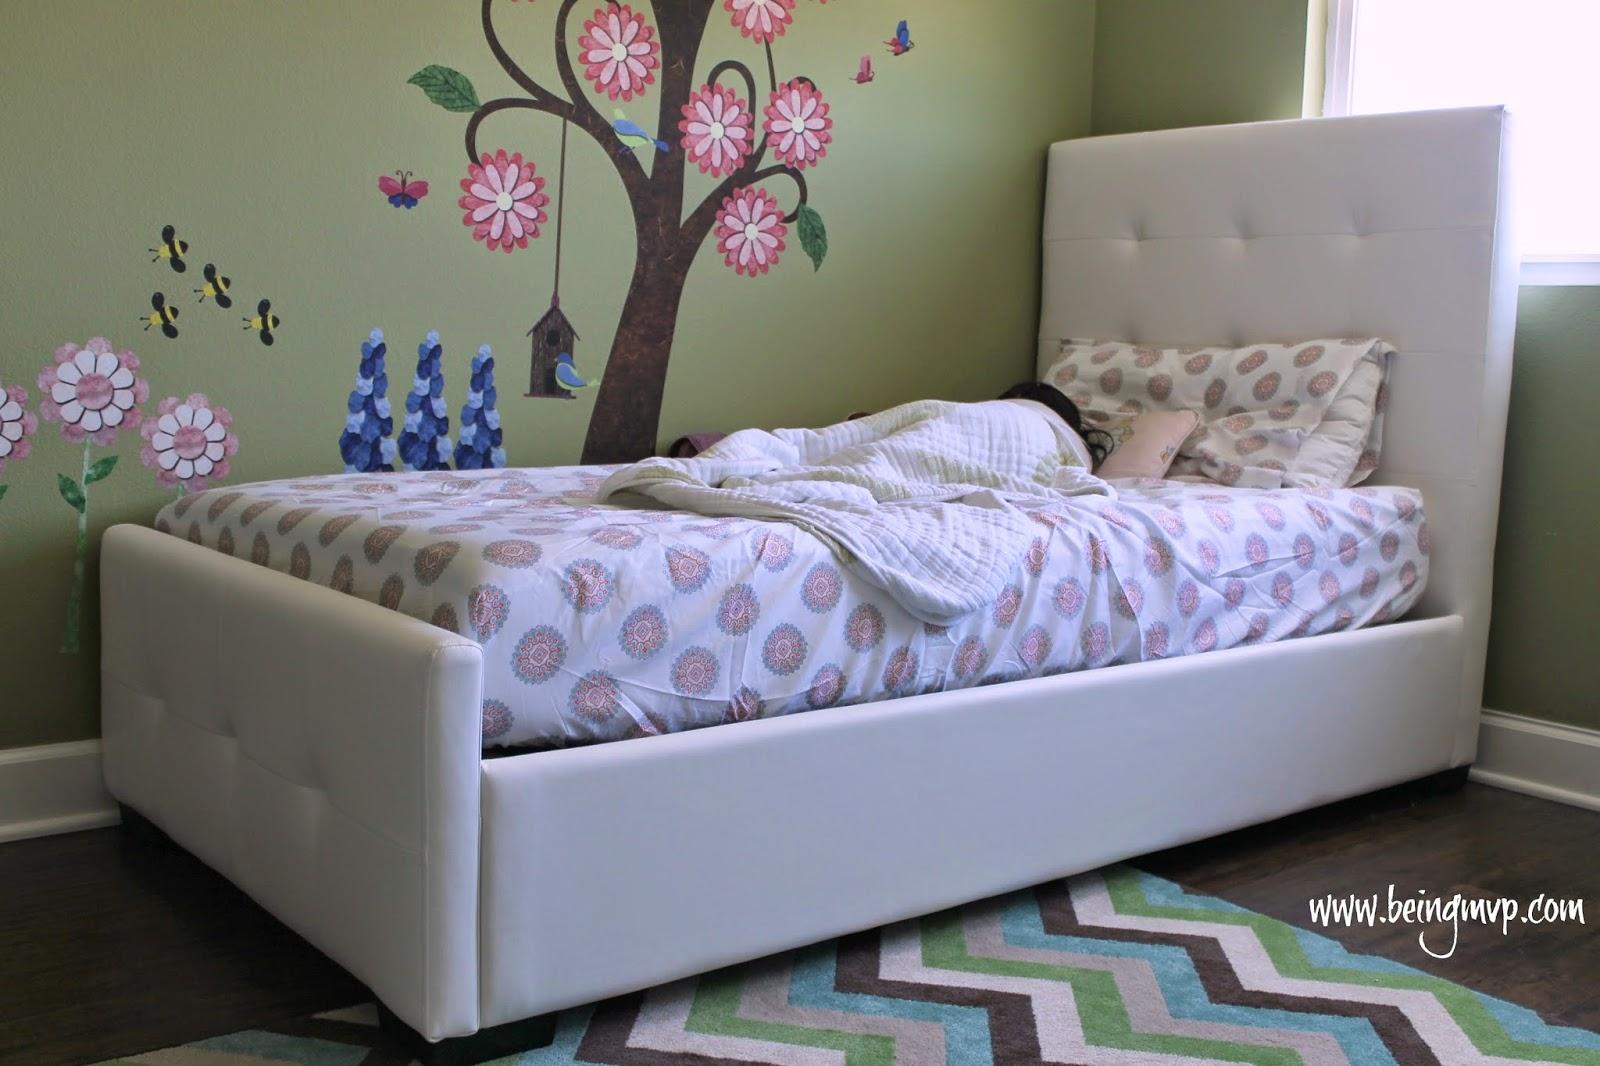 Stunning Kenzie us Room Makeover DHP Furniture Giveaway Disclosure I received a mattress frame